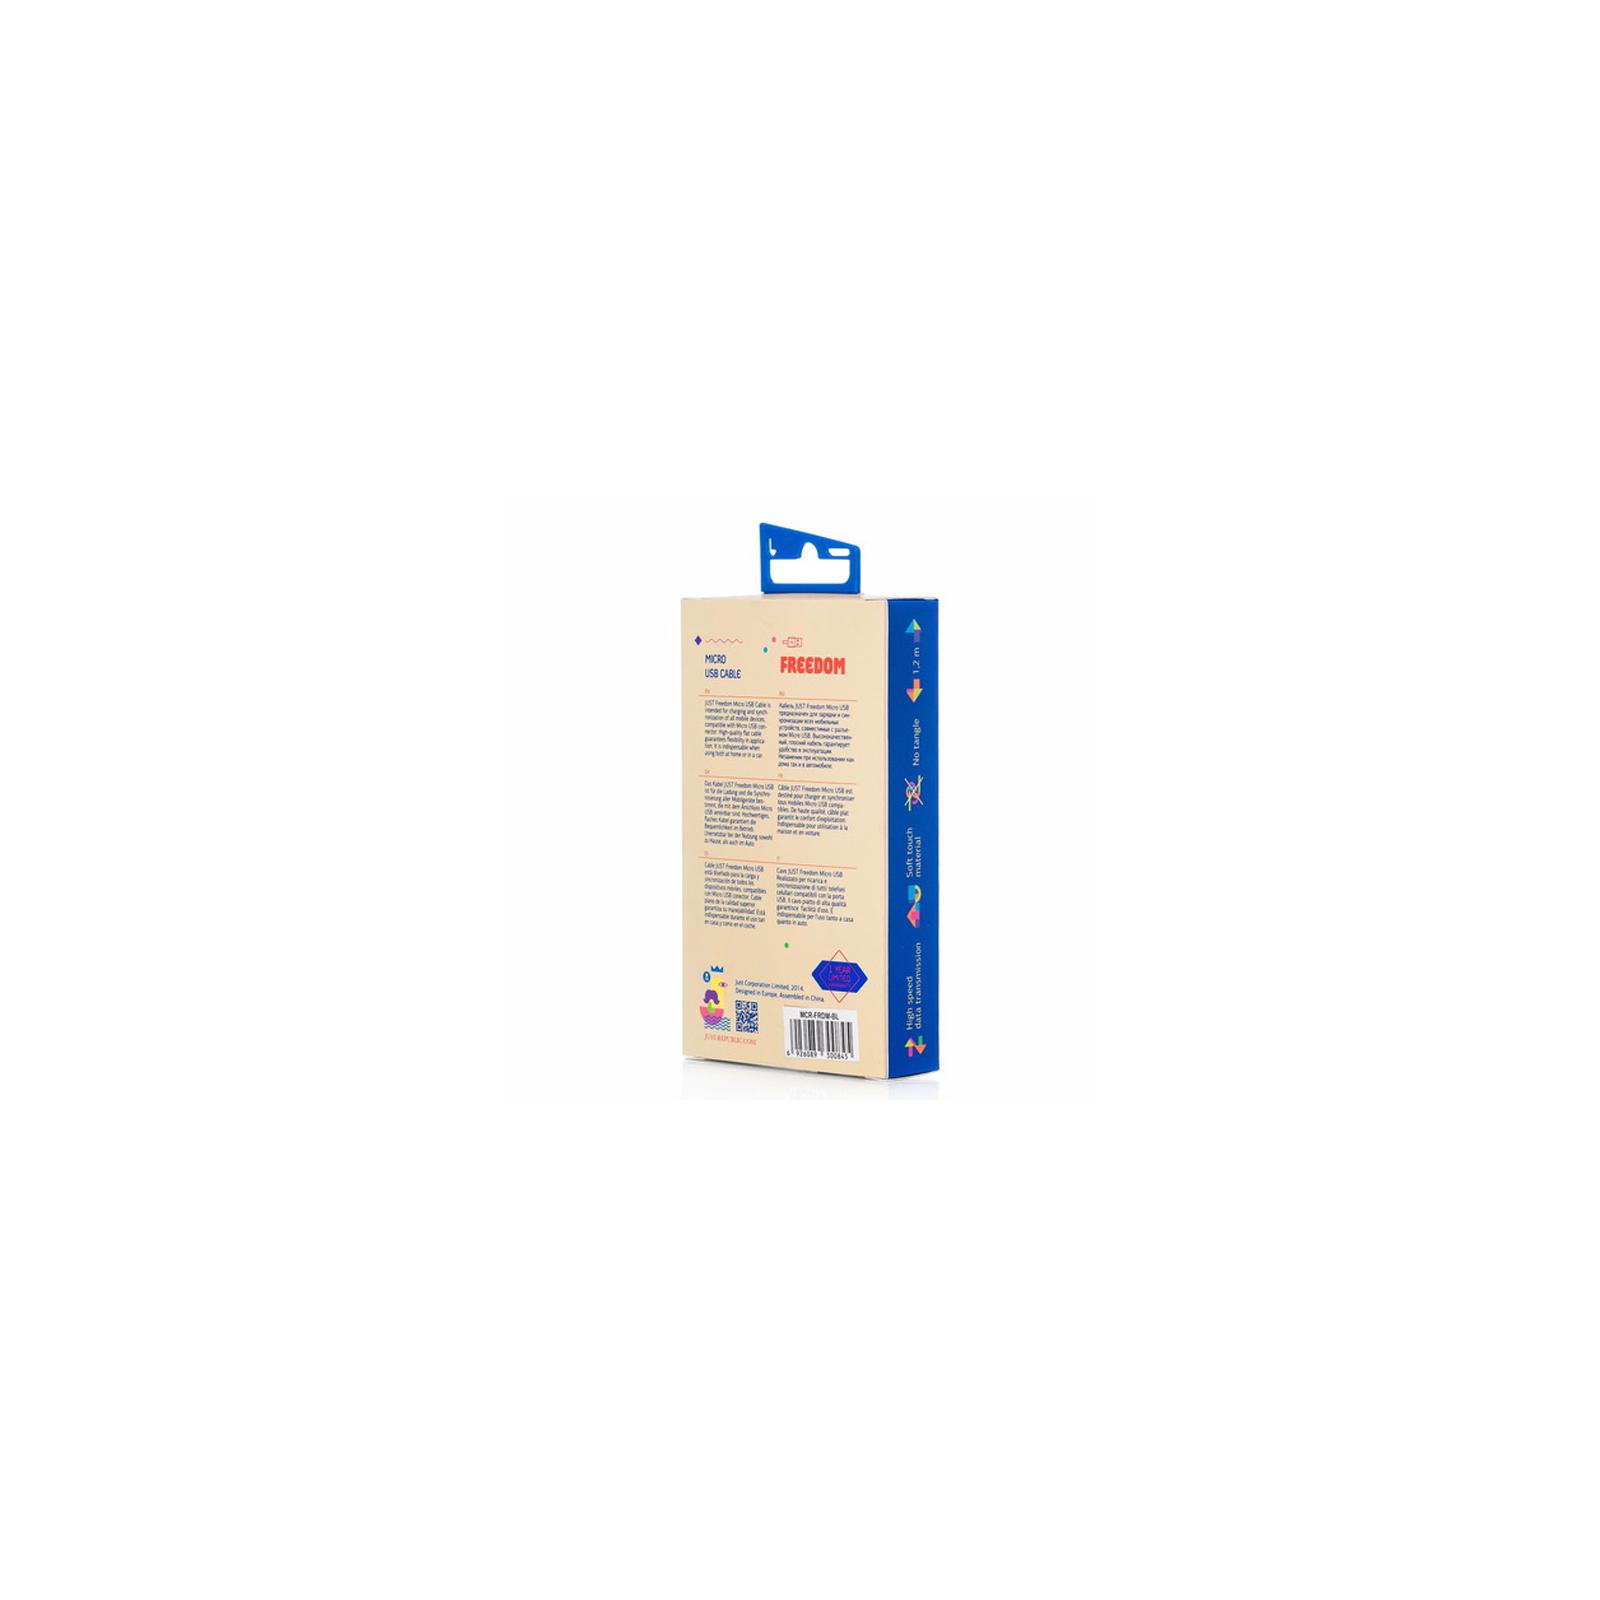 Дата кабель JUST Freedom Micro USB Cable Blue (MCR-FRDM-BL) изображение 4